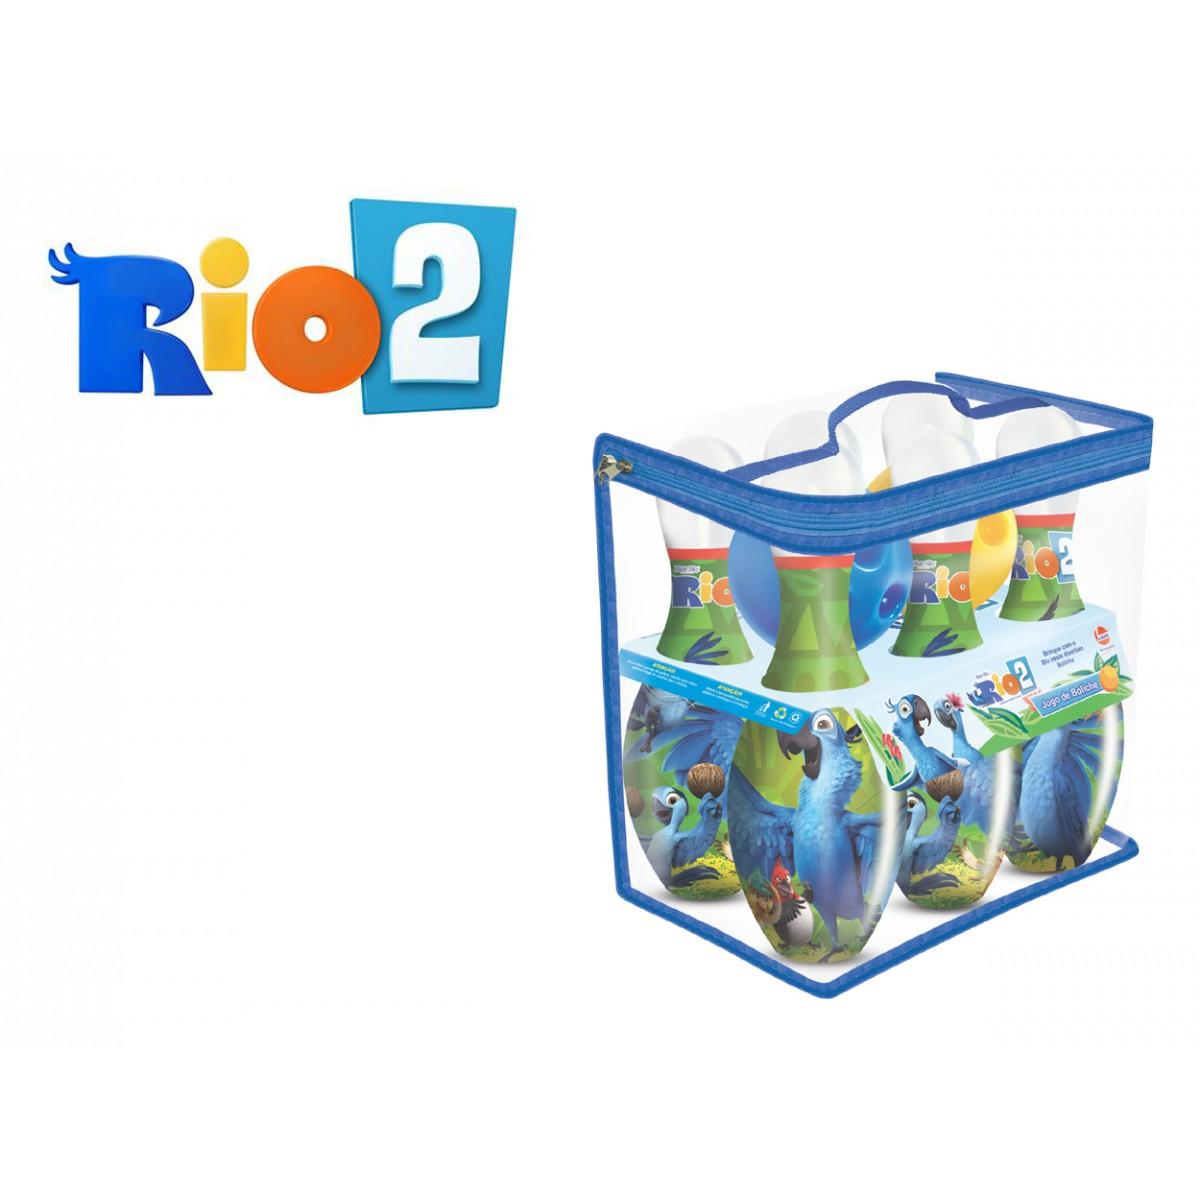 Jogo de Boliche Rio 2 - Lider Brinquedos